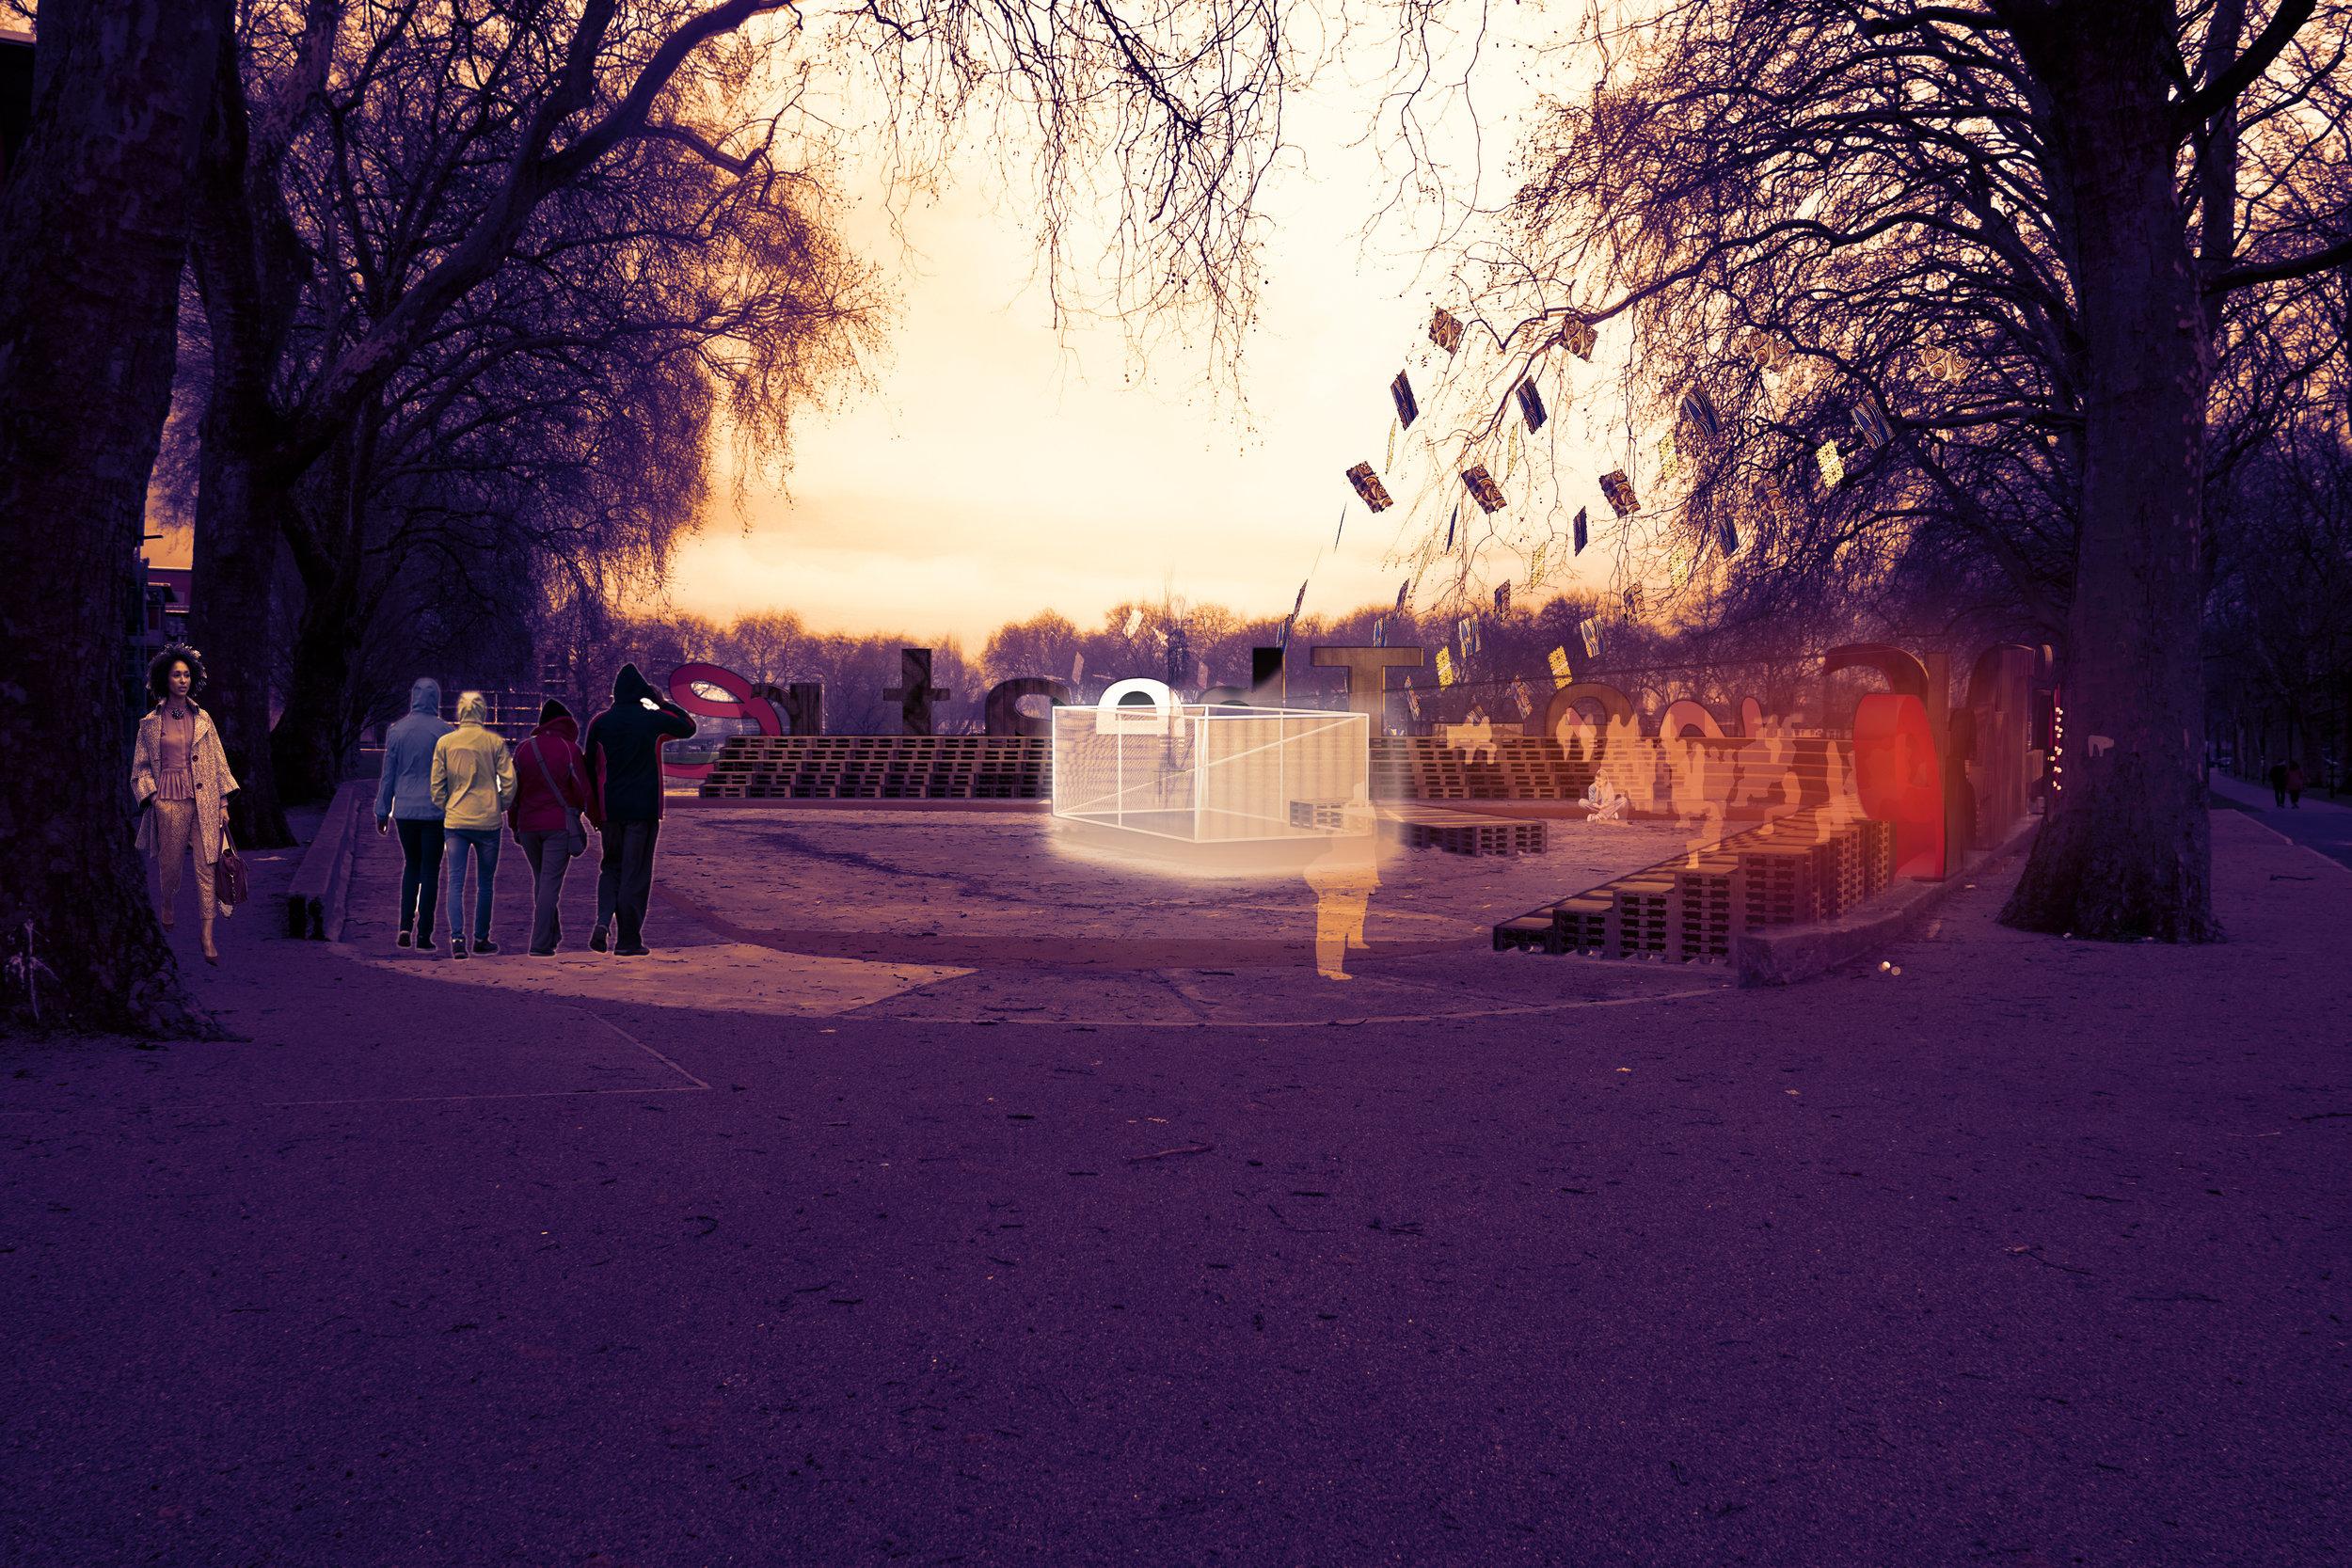 Cine - Theatre Concept Image - Evening